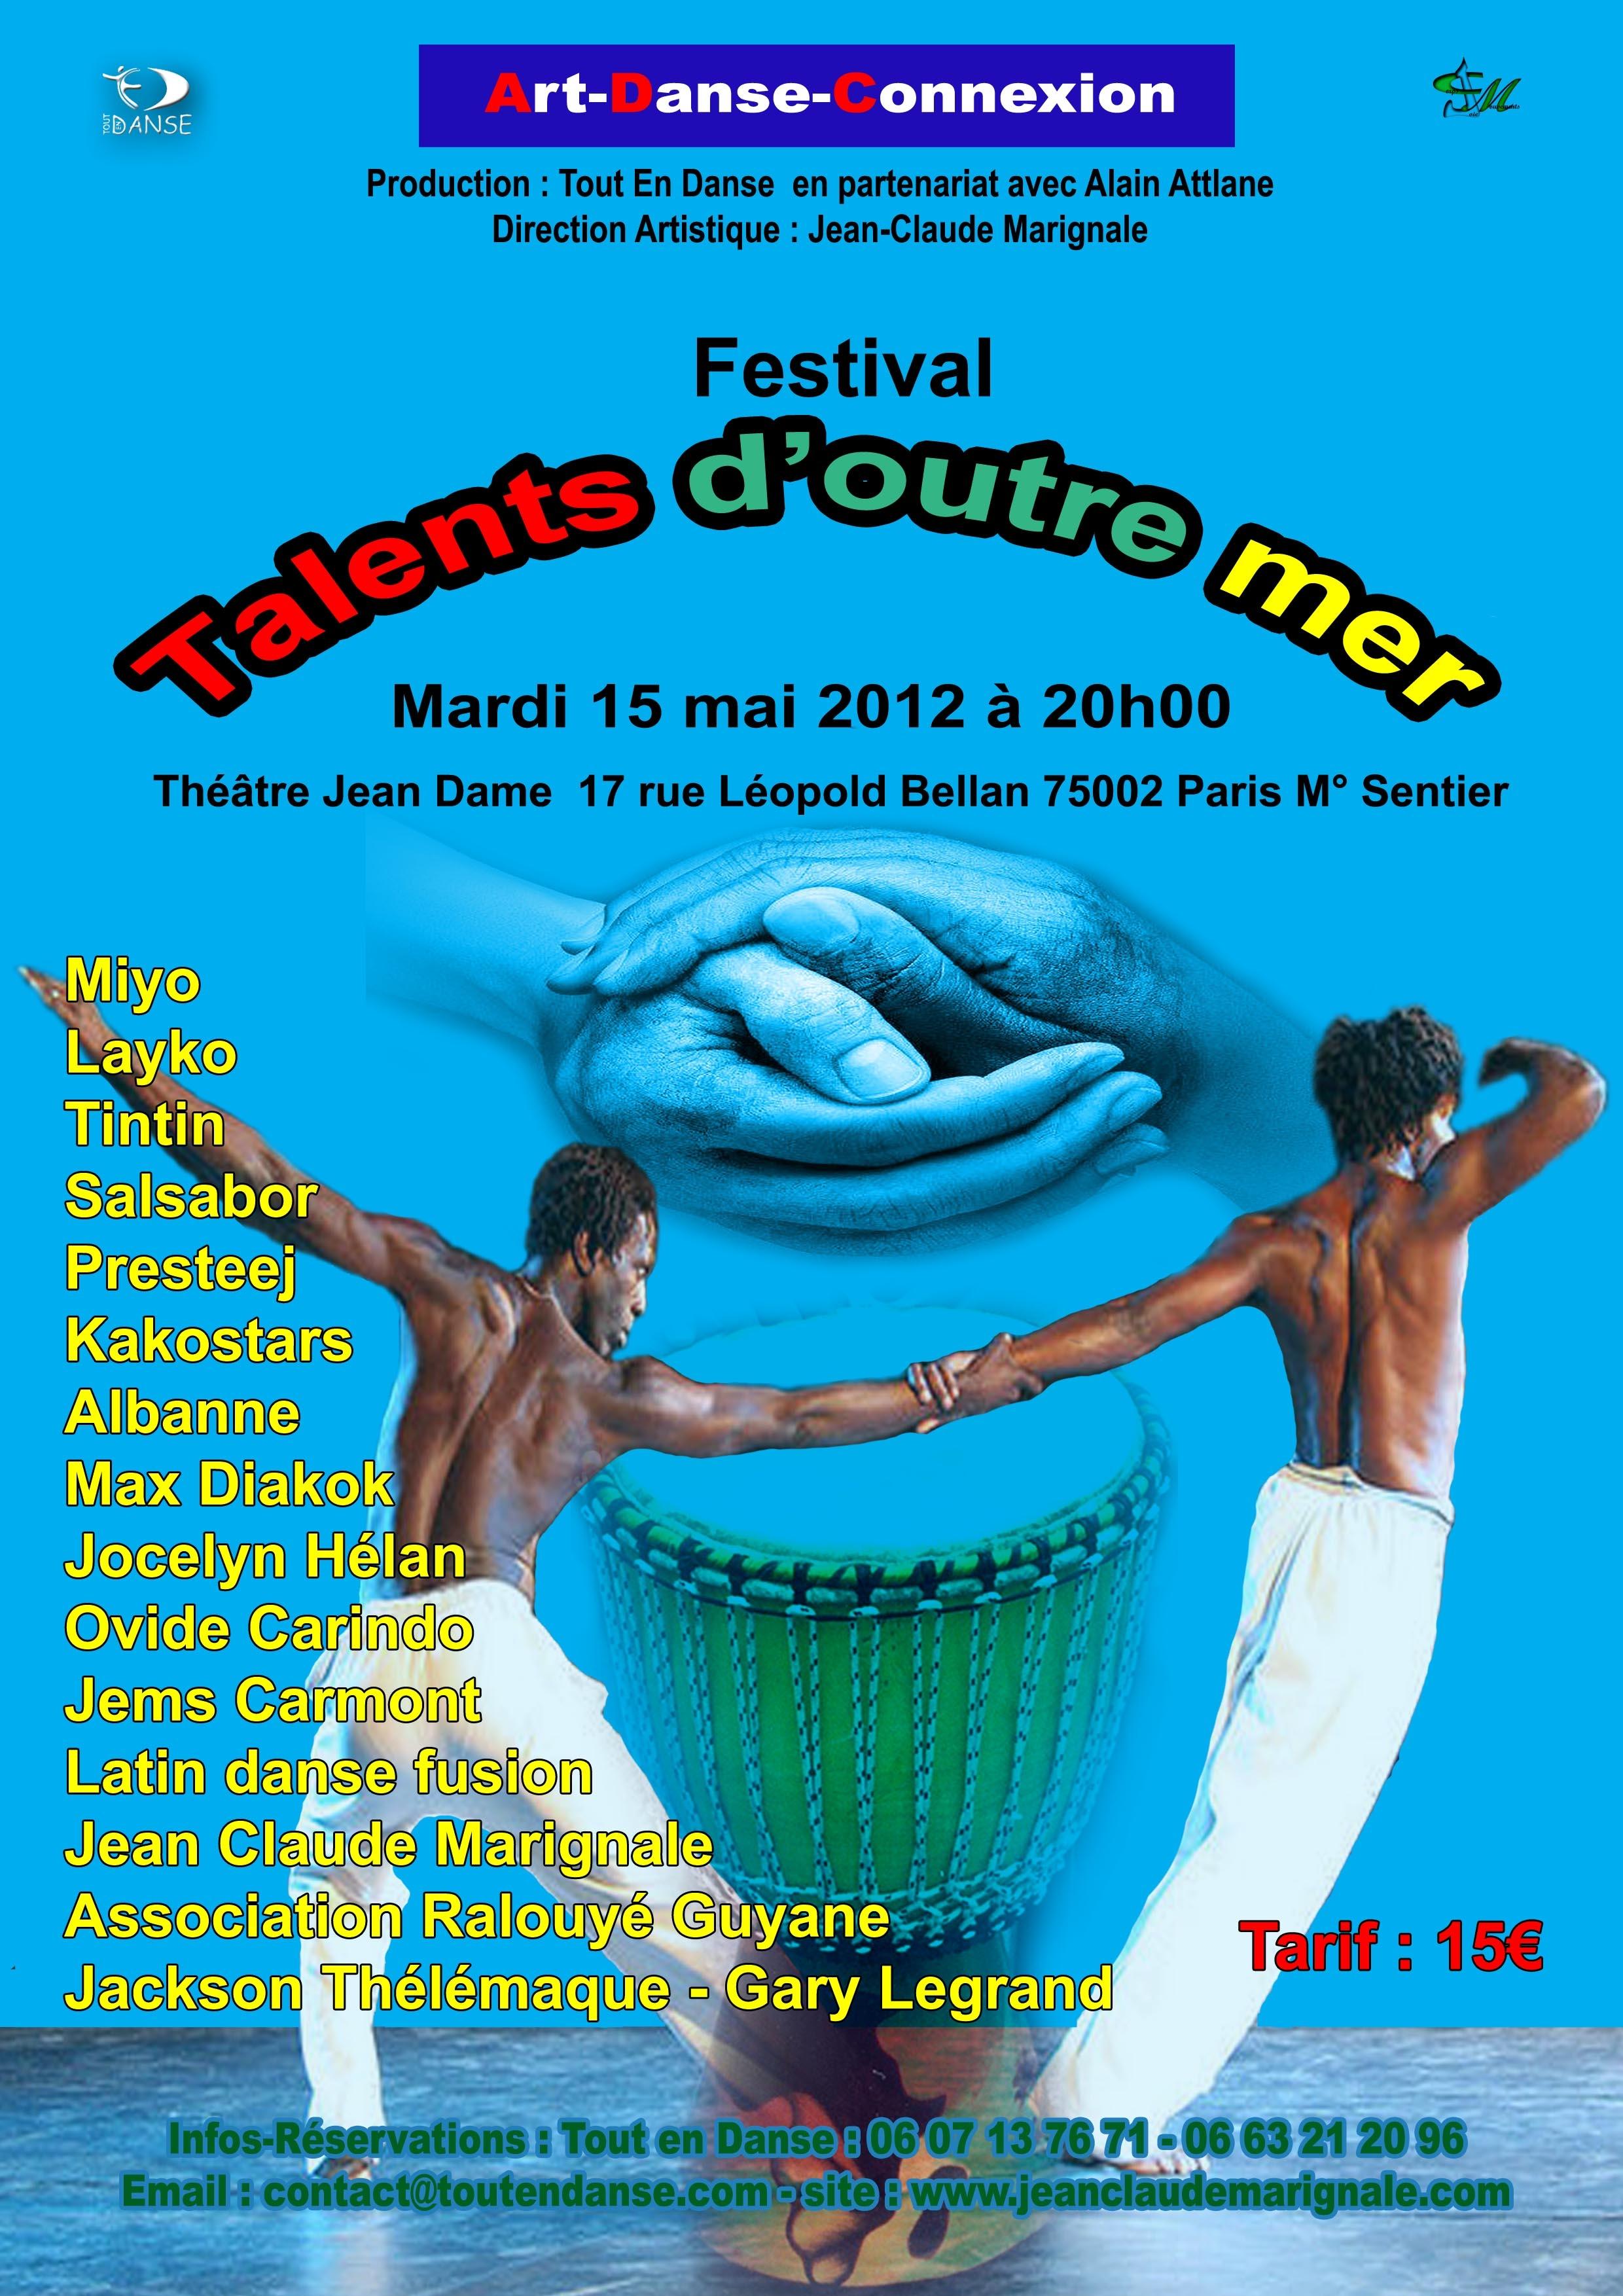 festival-art-danse-connexion-15-mai-afro-caraibe-bleu-plus-fonce-bis.jpg